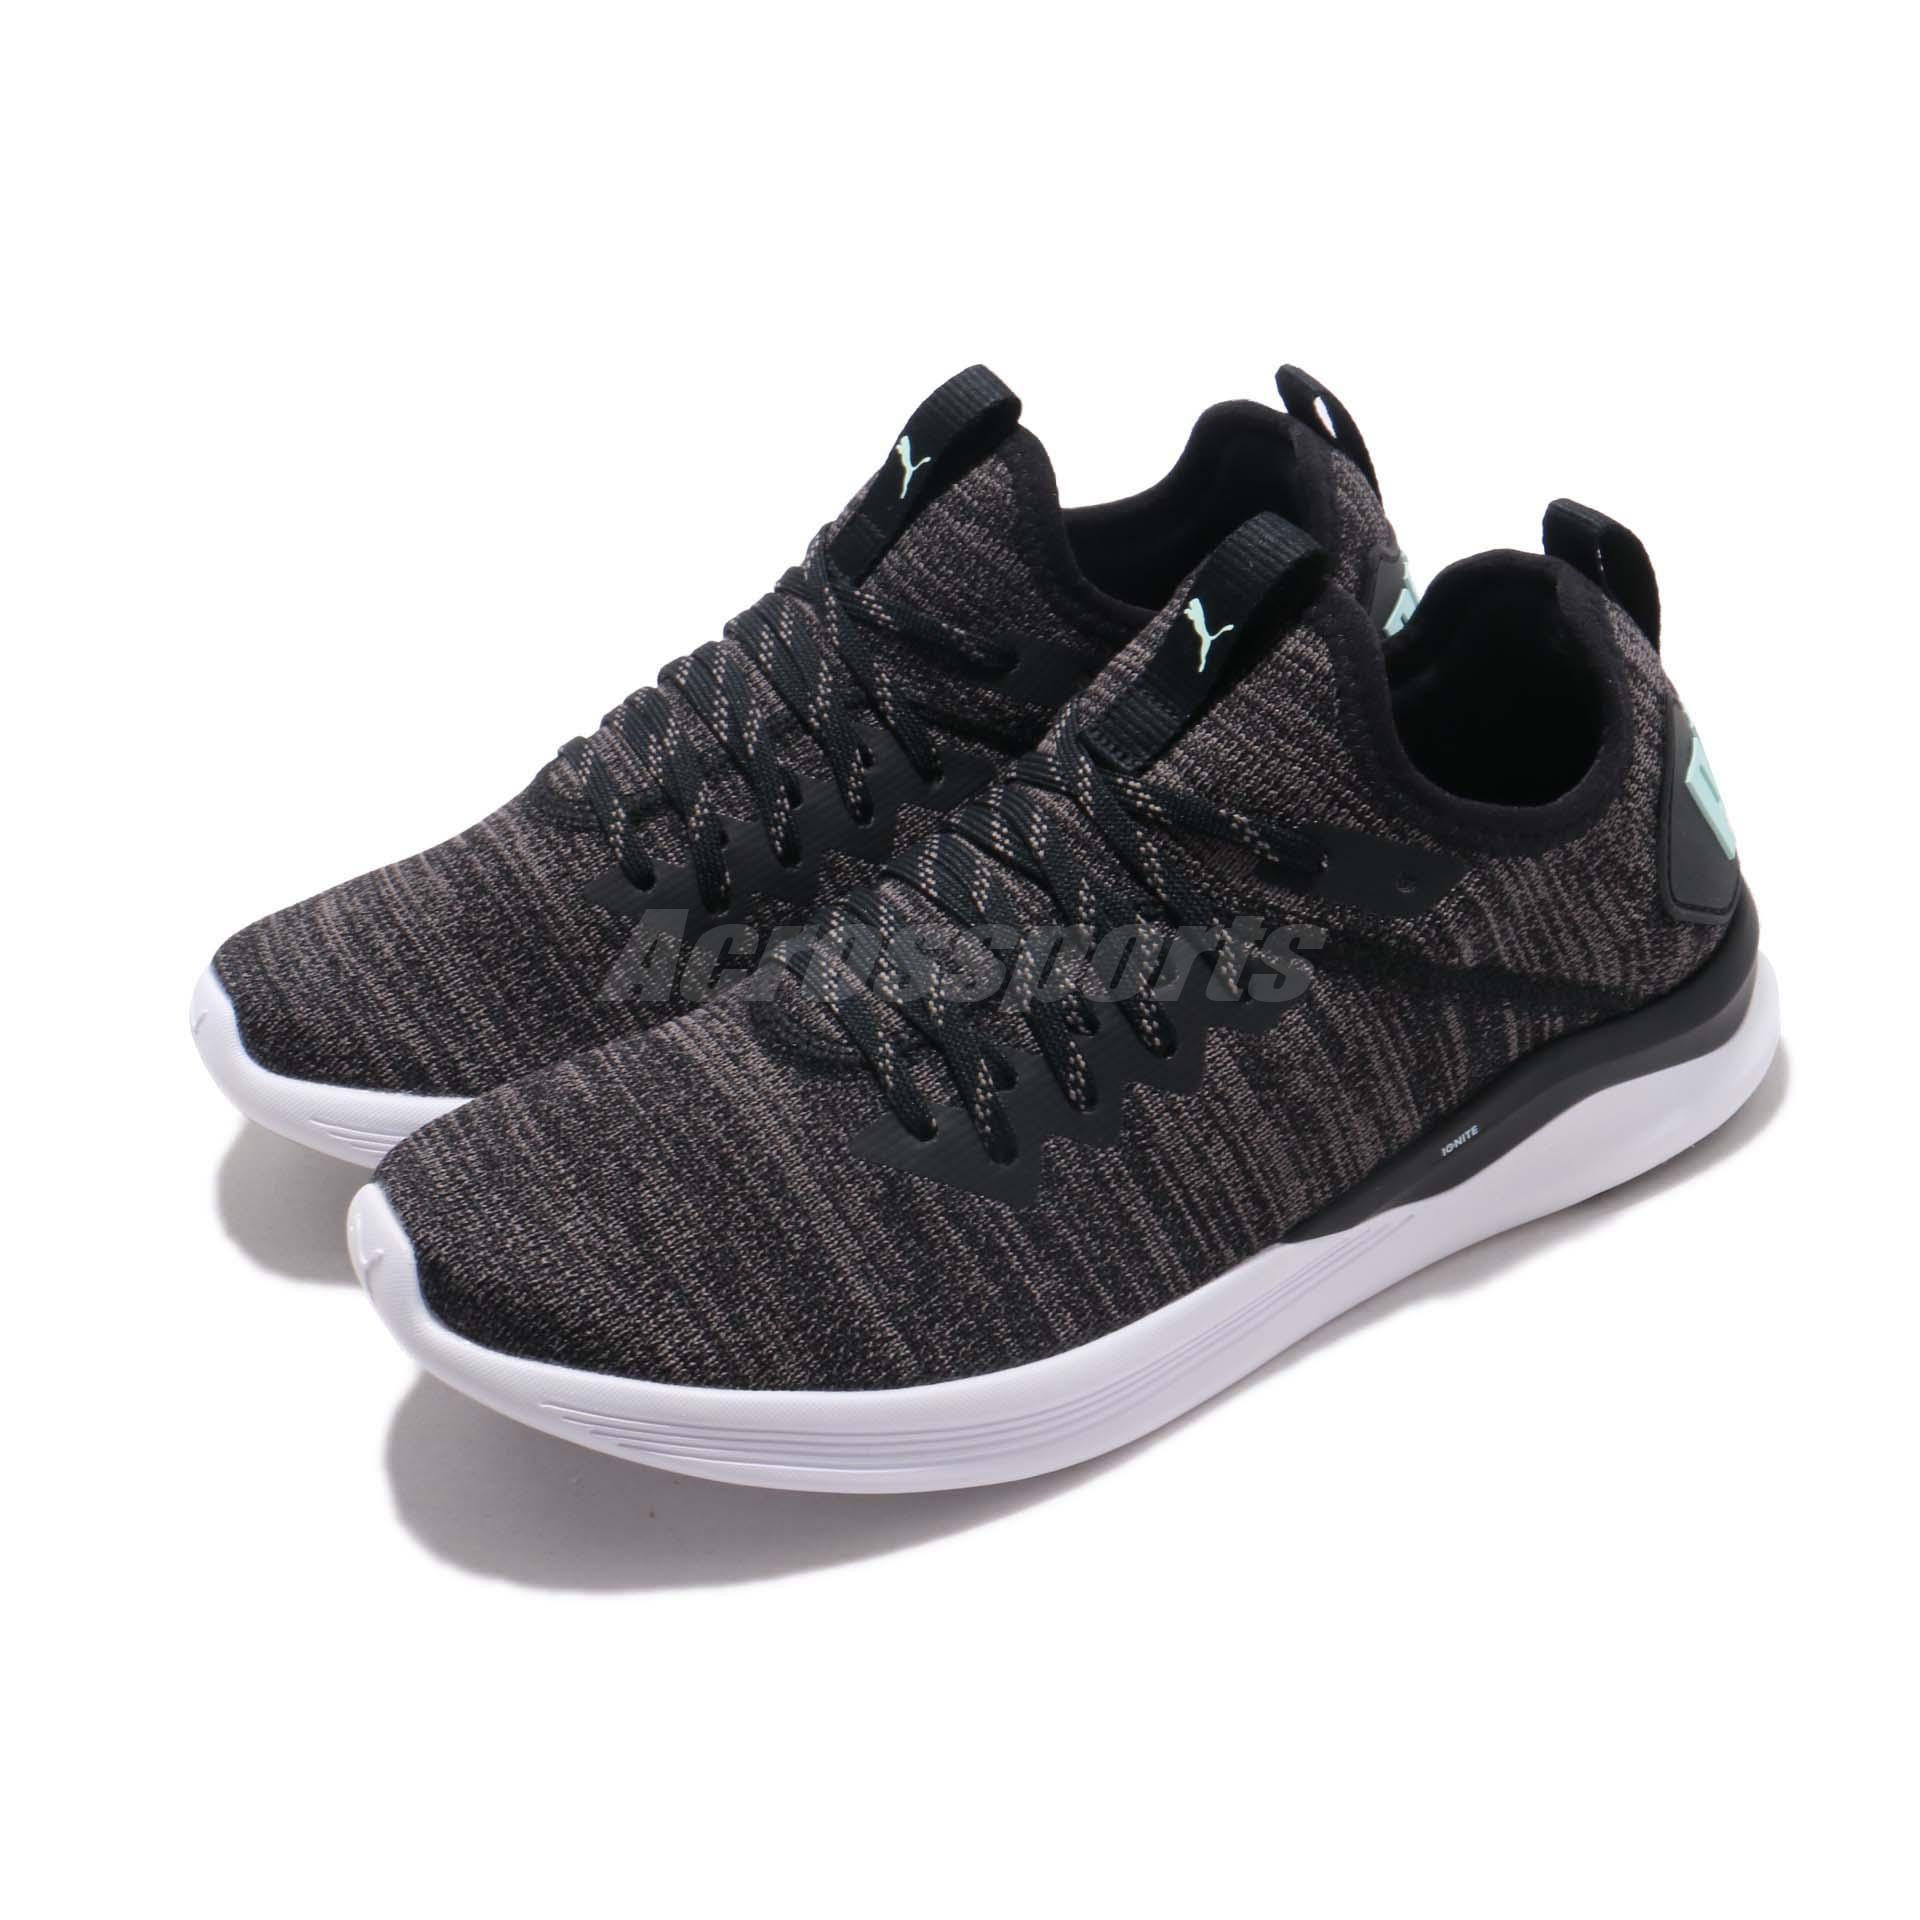 Details about Puma Ignite Flash EvoKnit Wns Black Charcoal Fair Aqua Women  Shoes 190511-17 577468f77